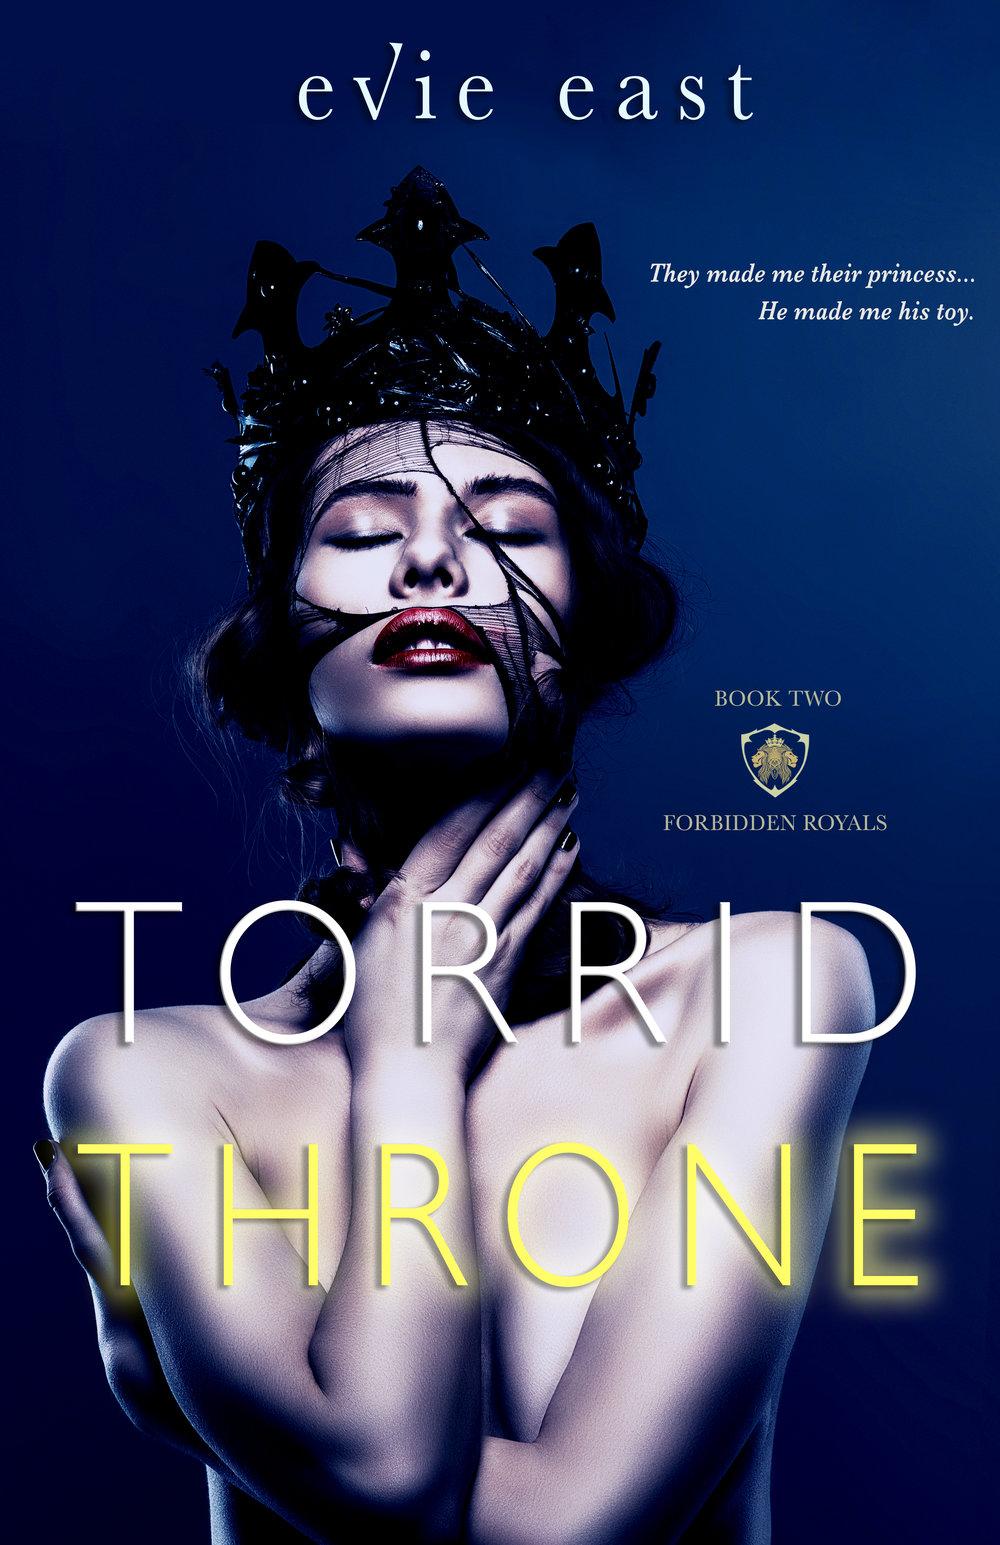 torrid throne final cover.jpg